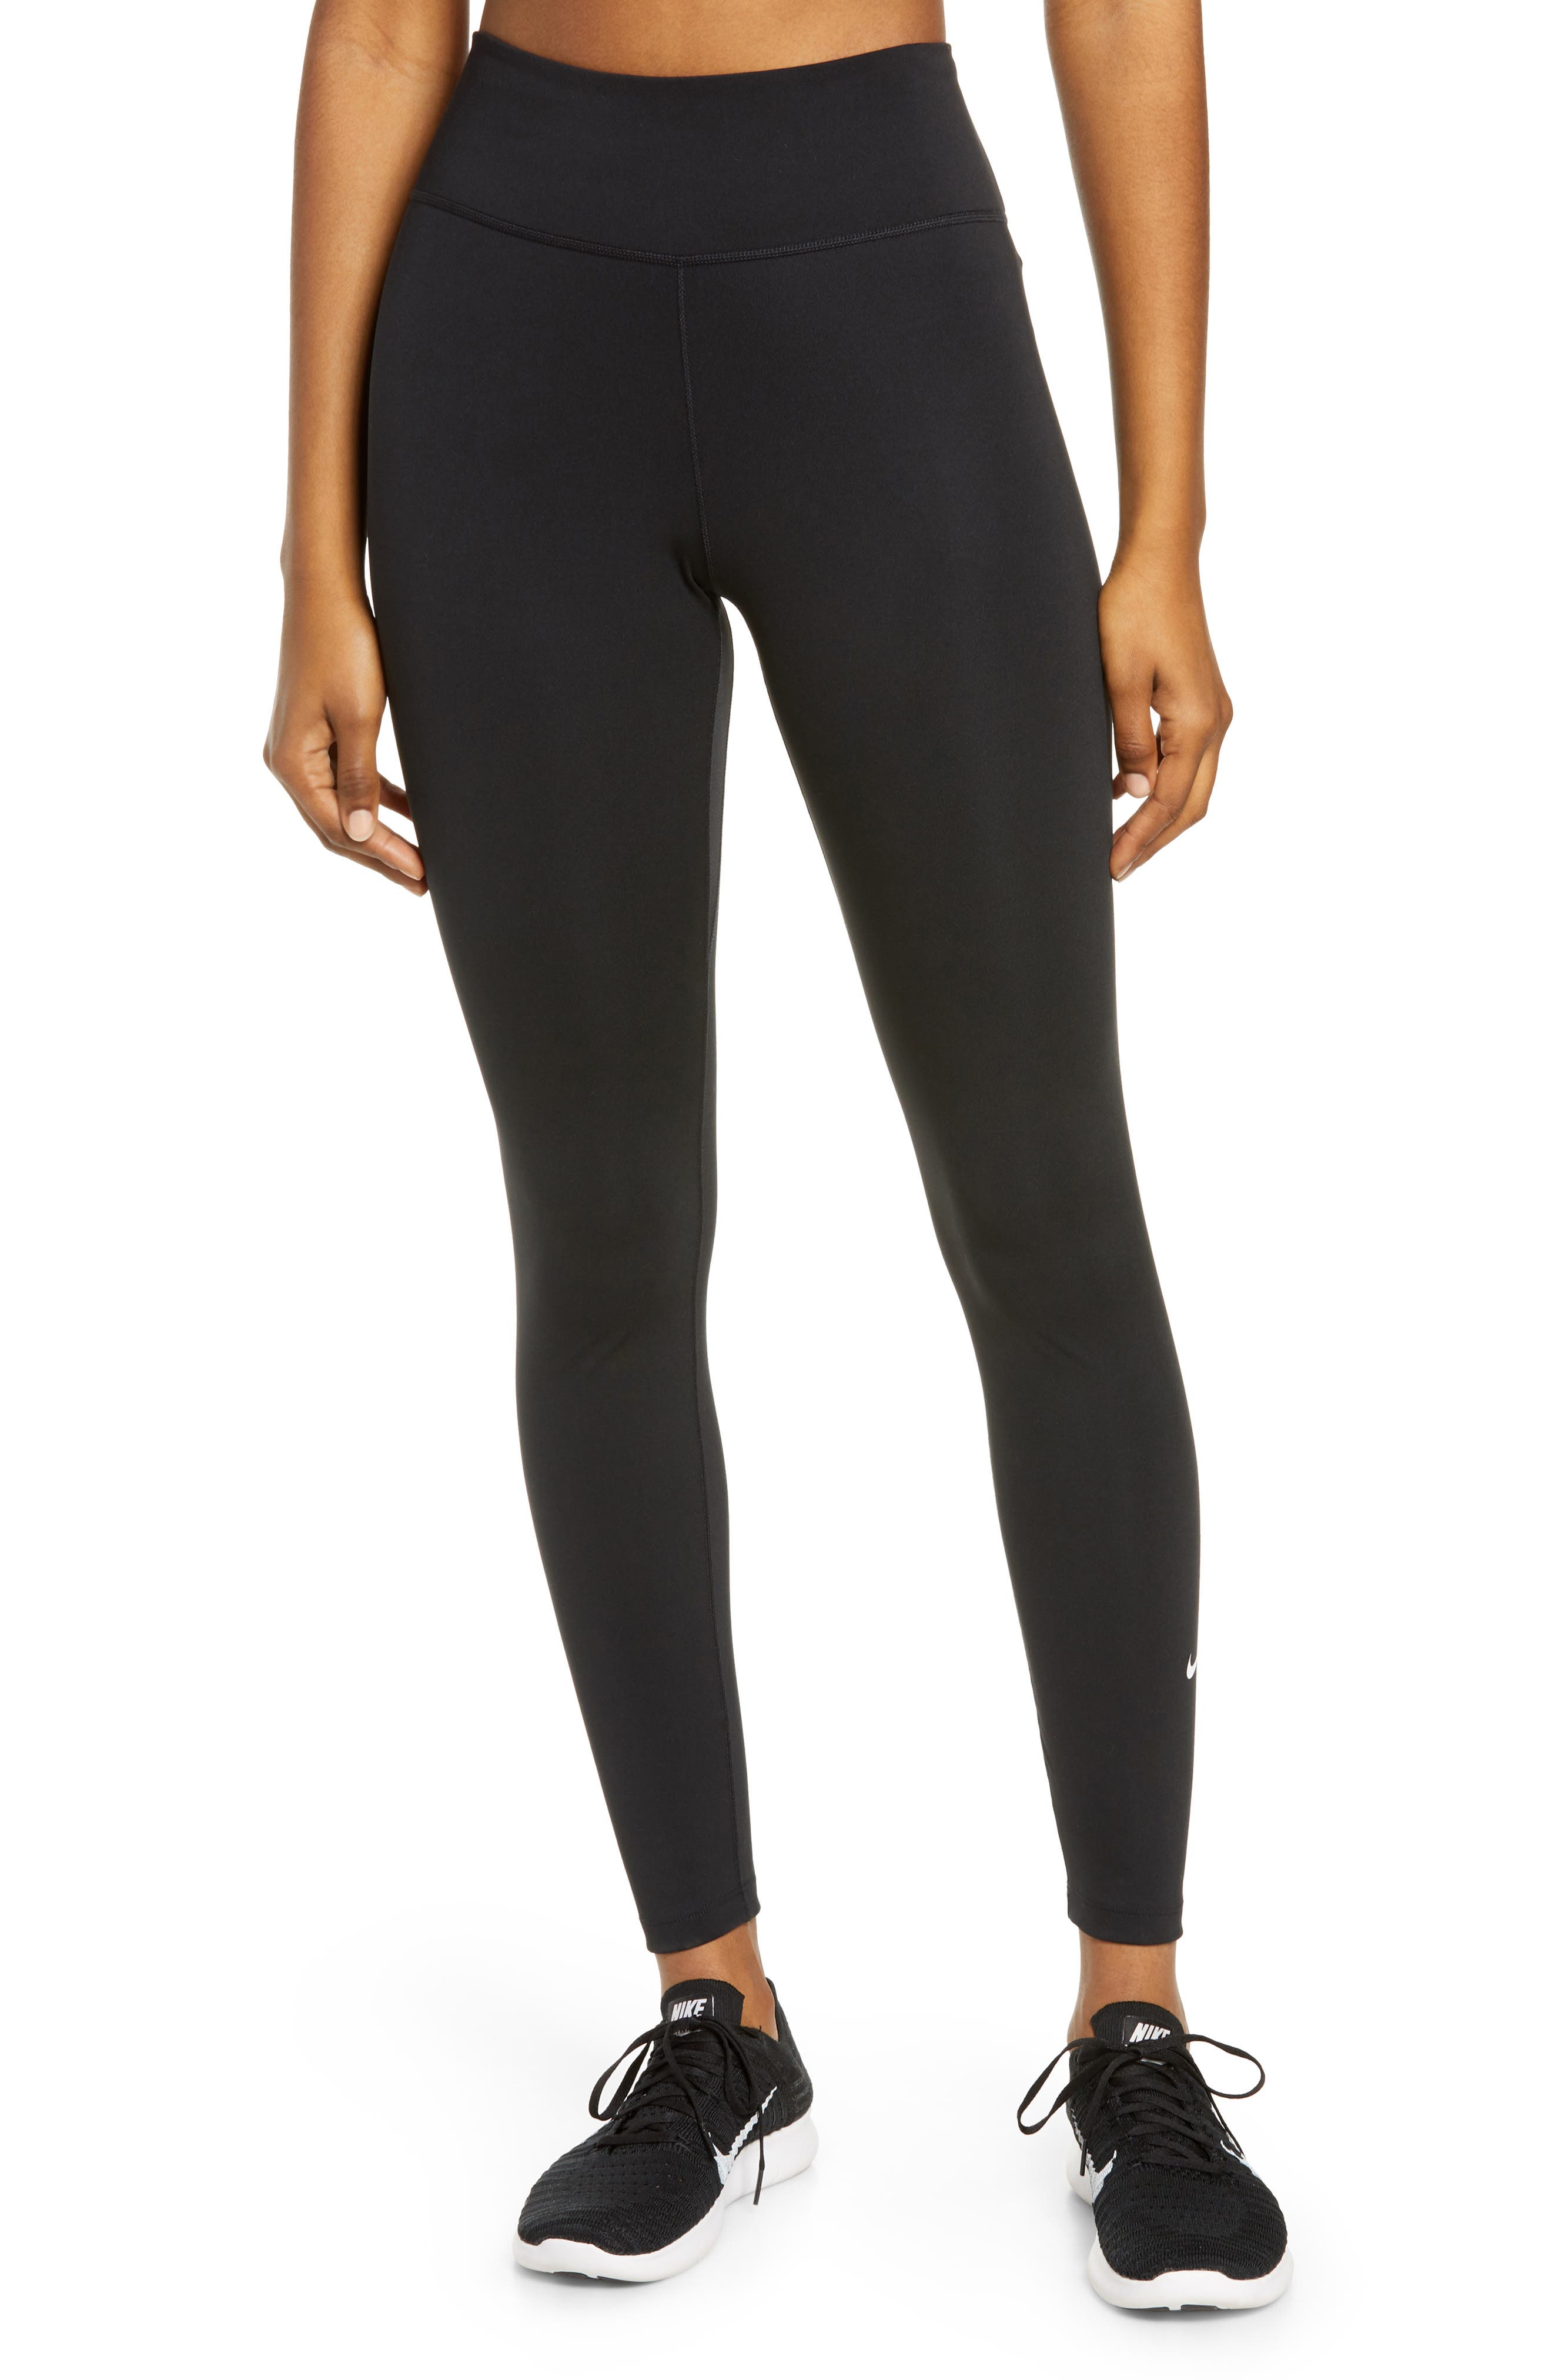 Leggings Ruja Womens Pro Modern Athletic Fitness Workout Yoga Pants